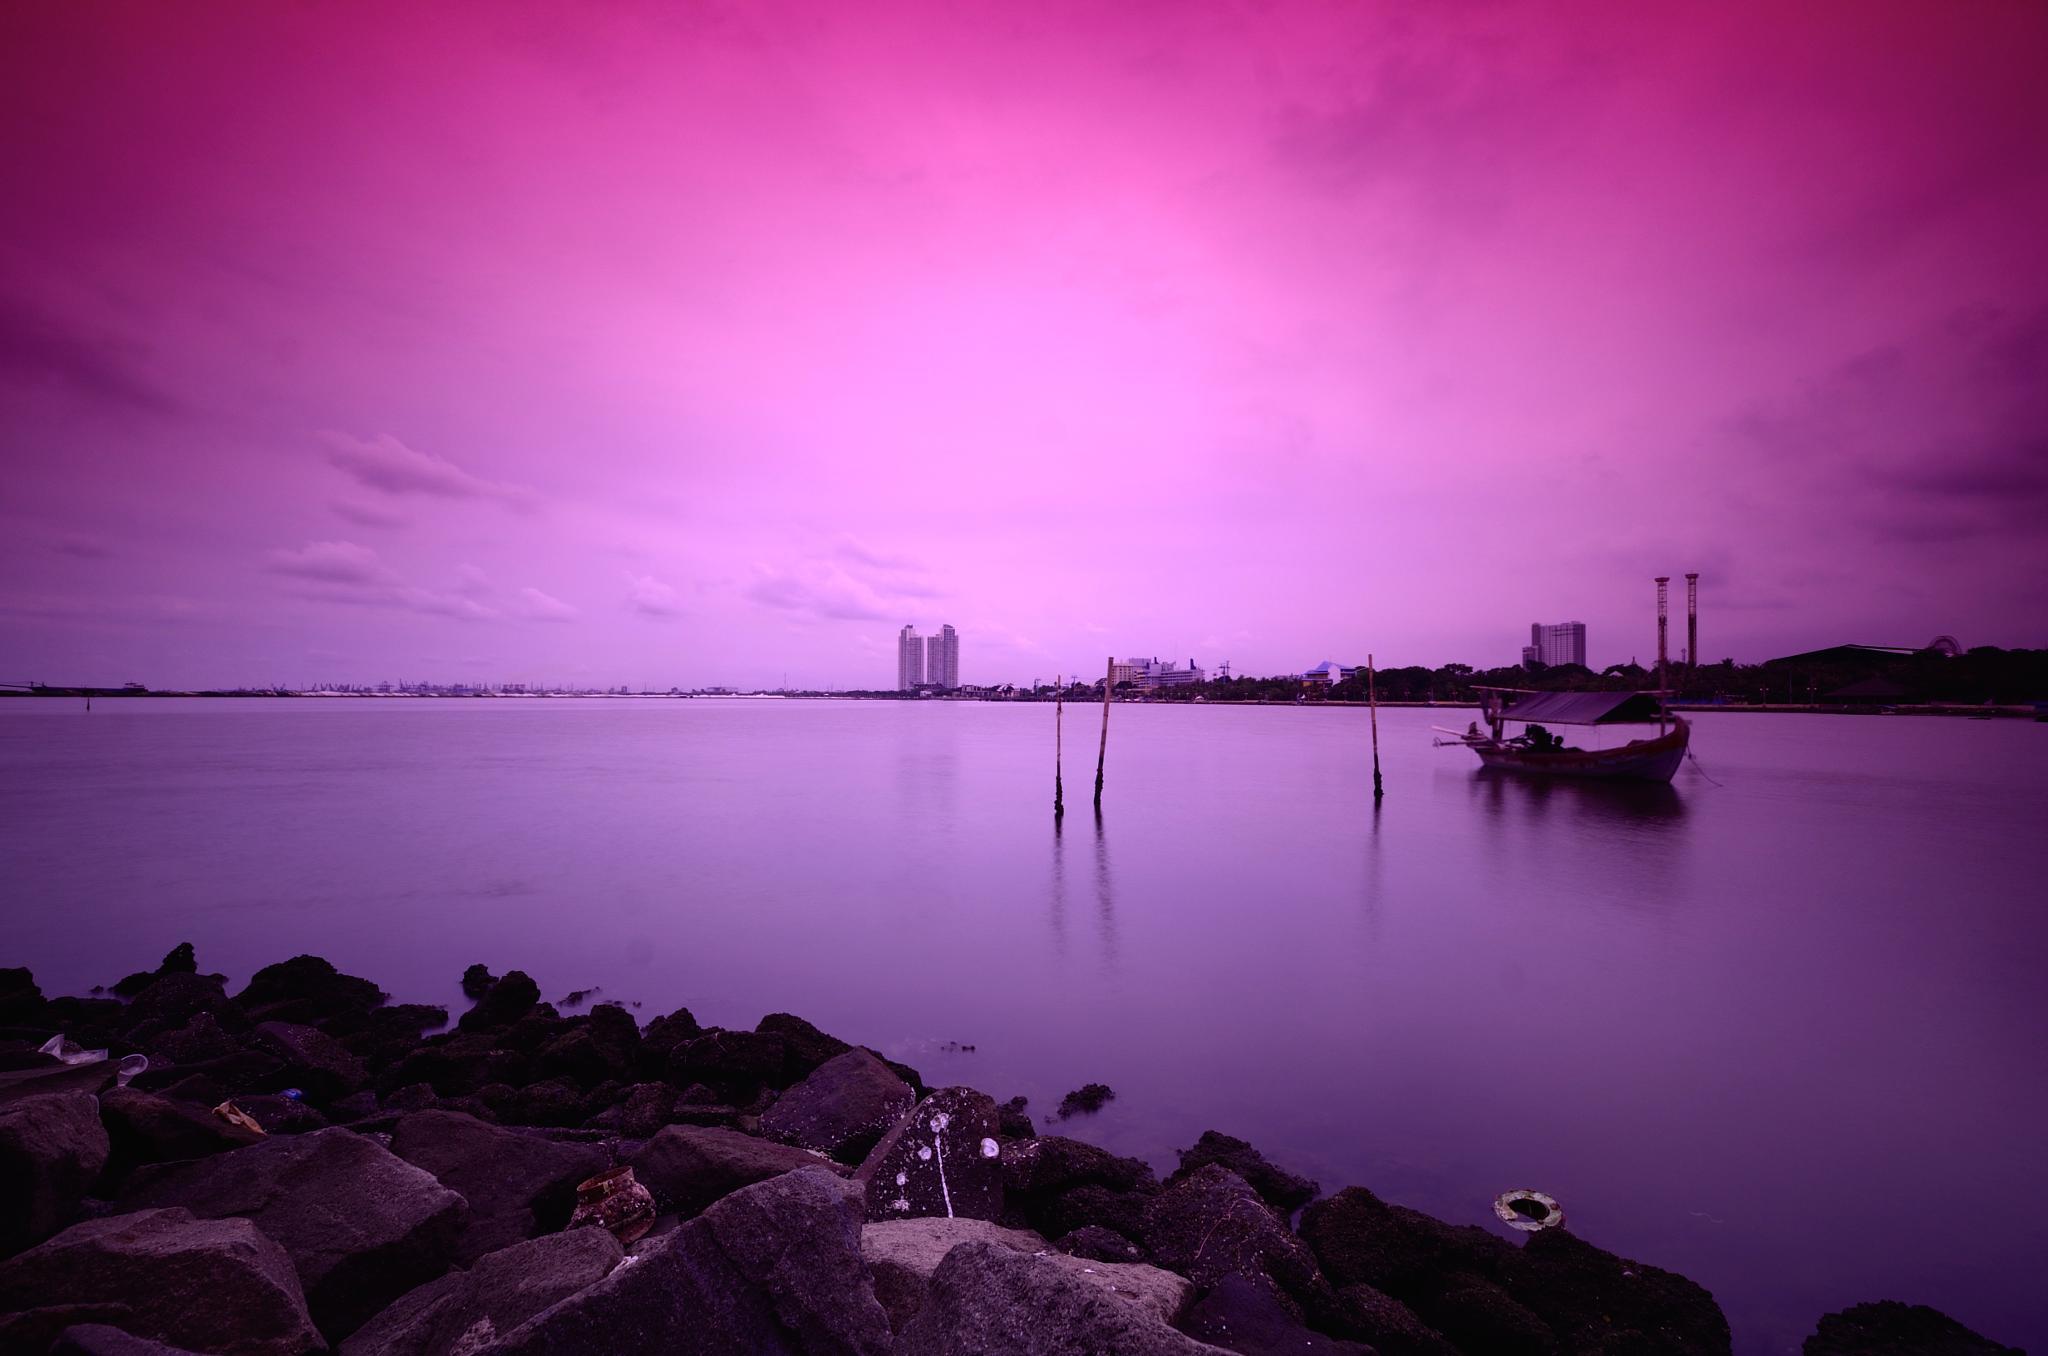 Pinkish Day by Yulius B Susilo